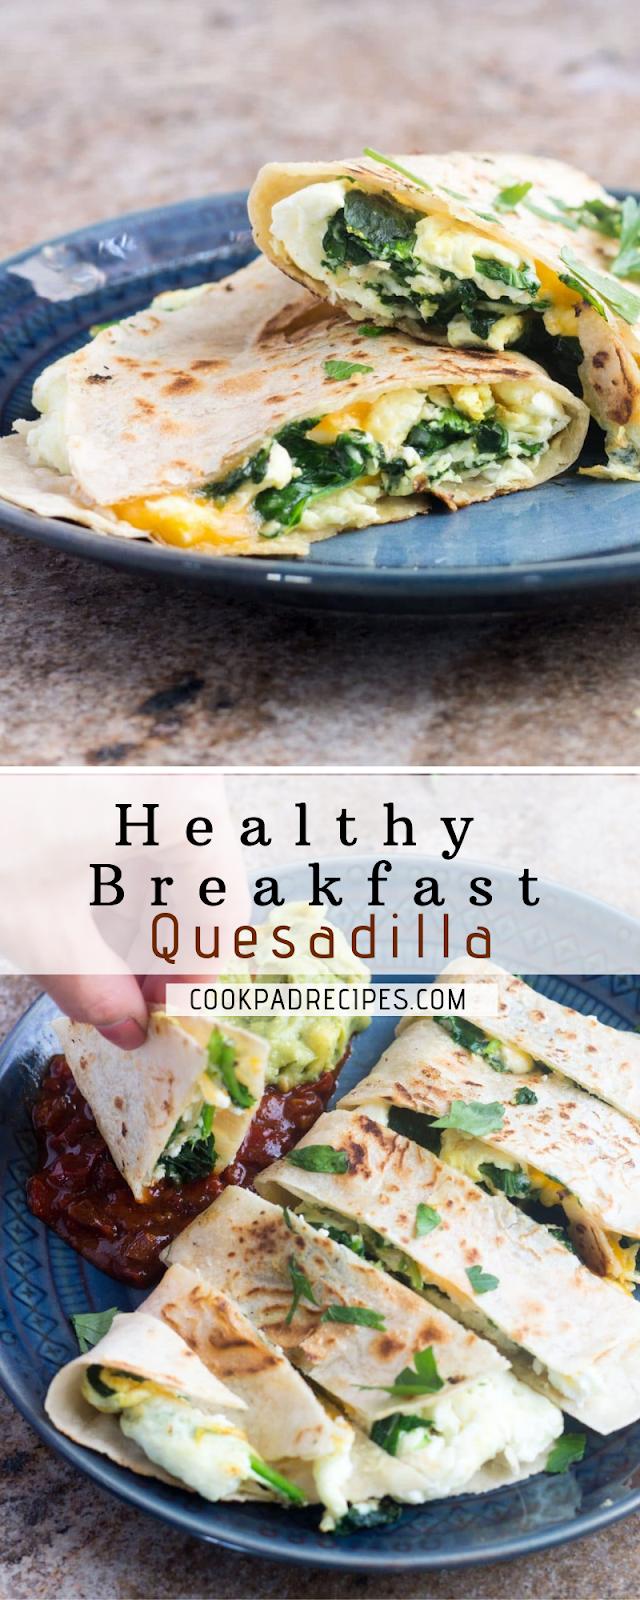 Healthy Breakfast Quеѕаdіllа